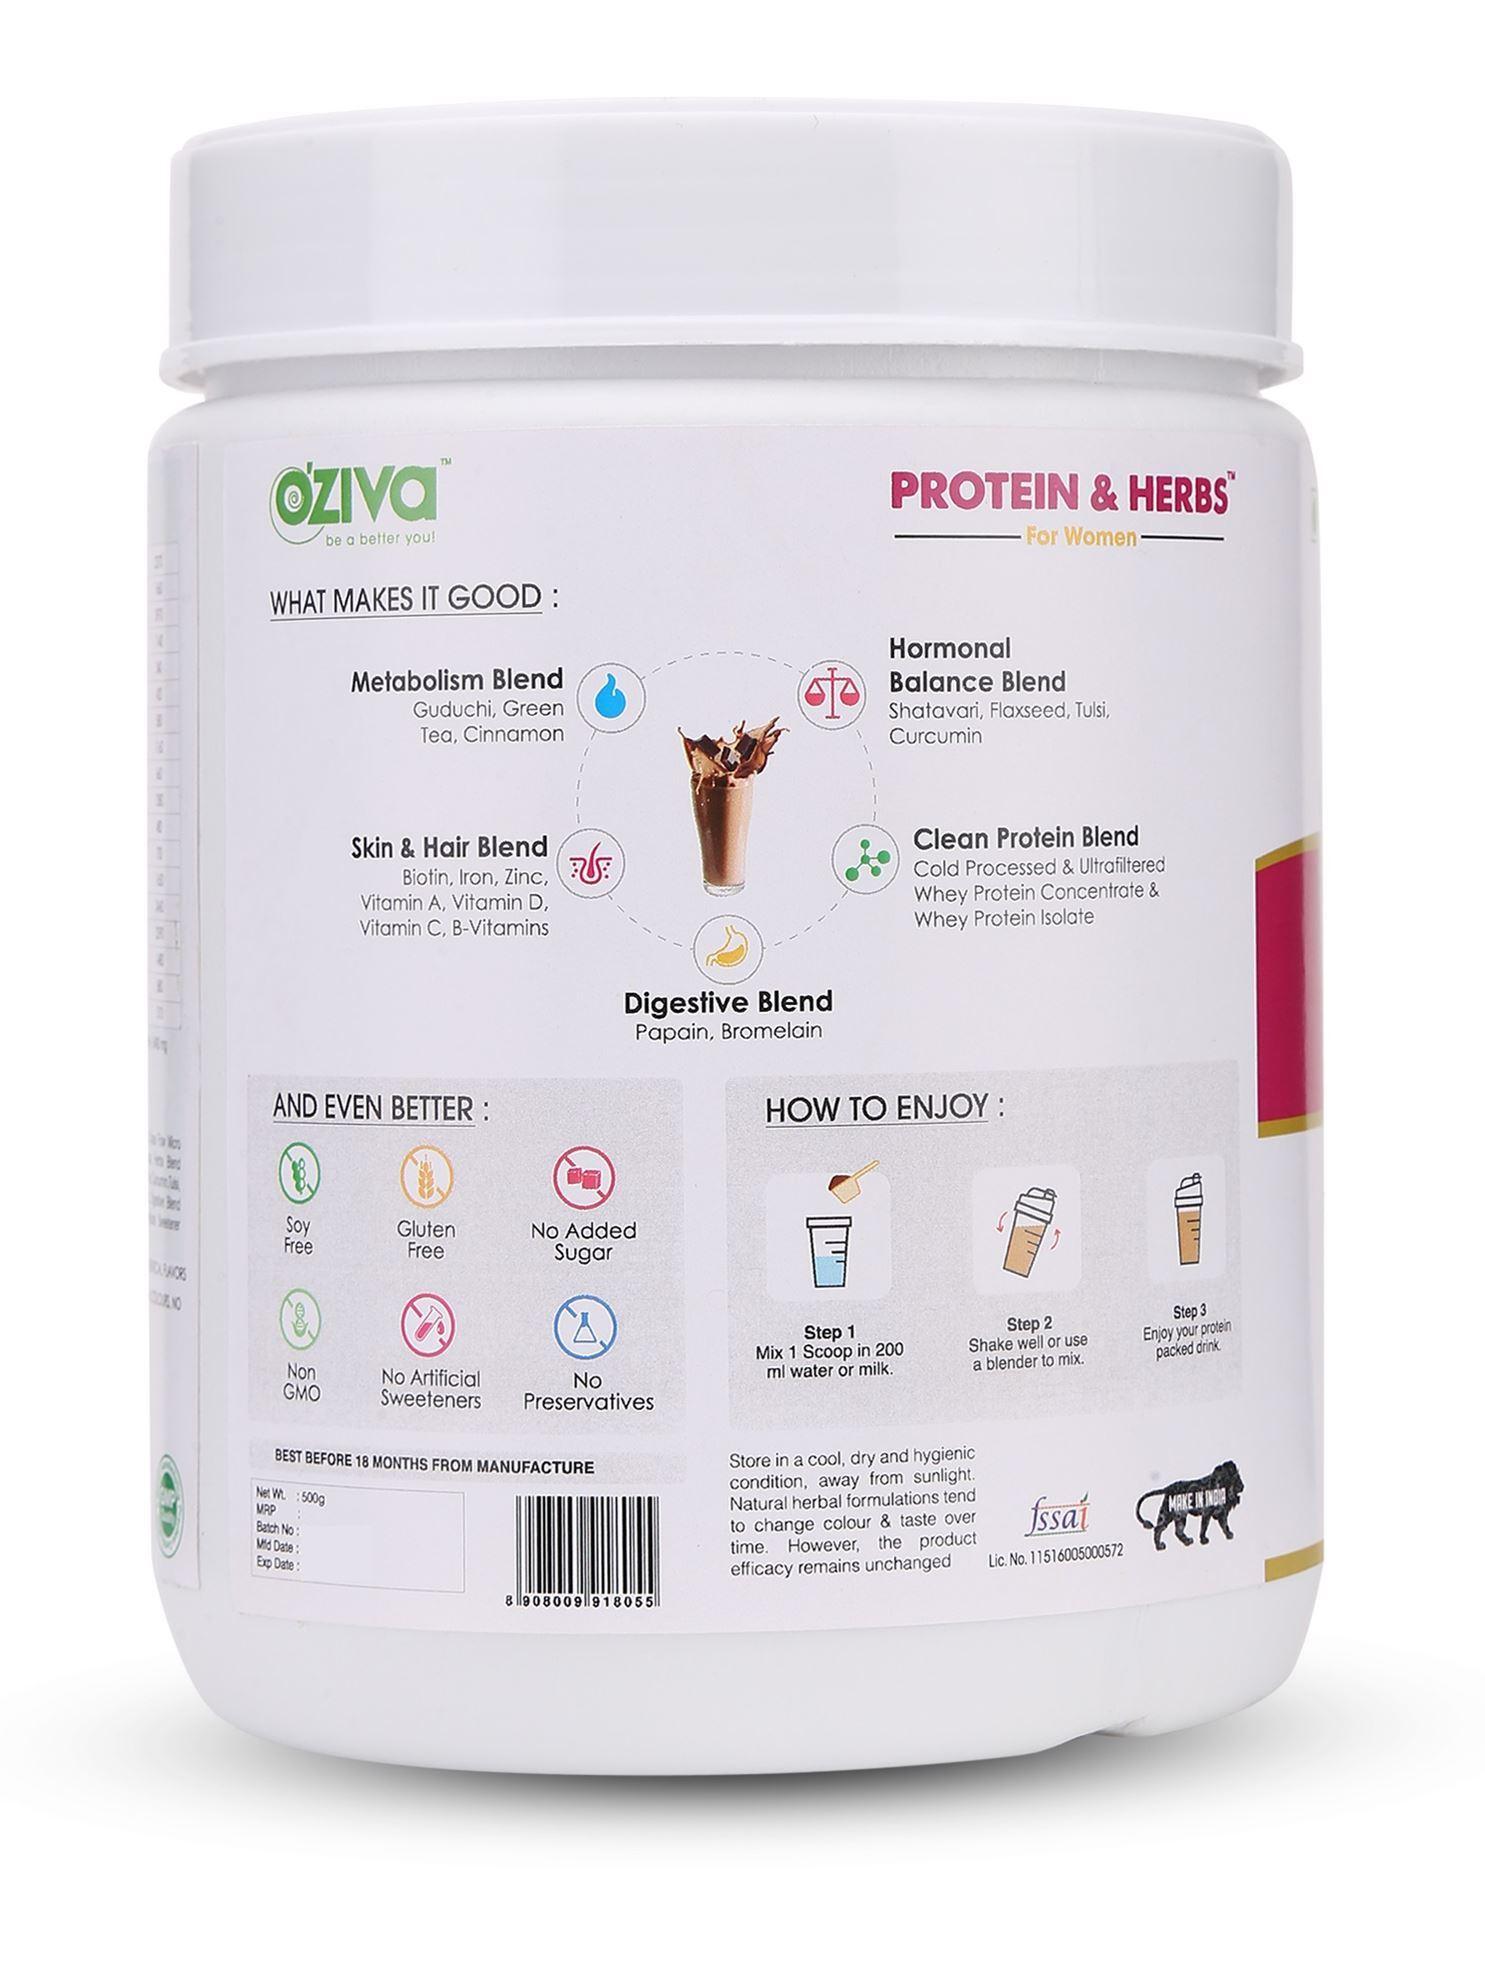 Picture of OZiva Protein & Herbs, Women - Whey Protein Powder with Ayurvedic Herbs & Multivitamins